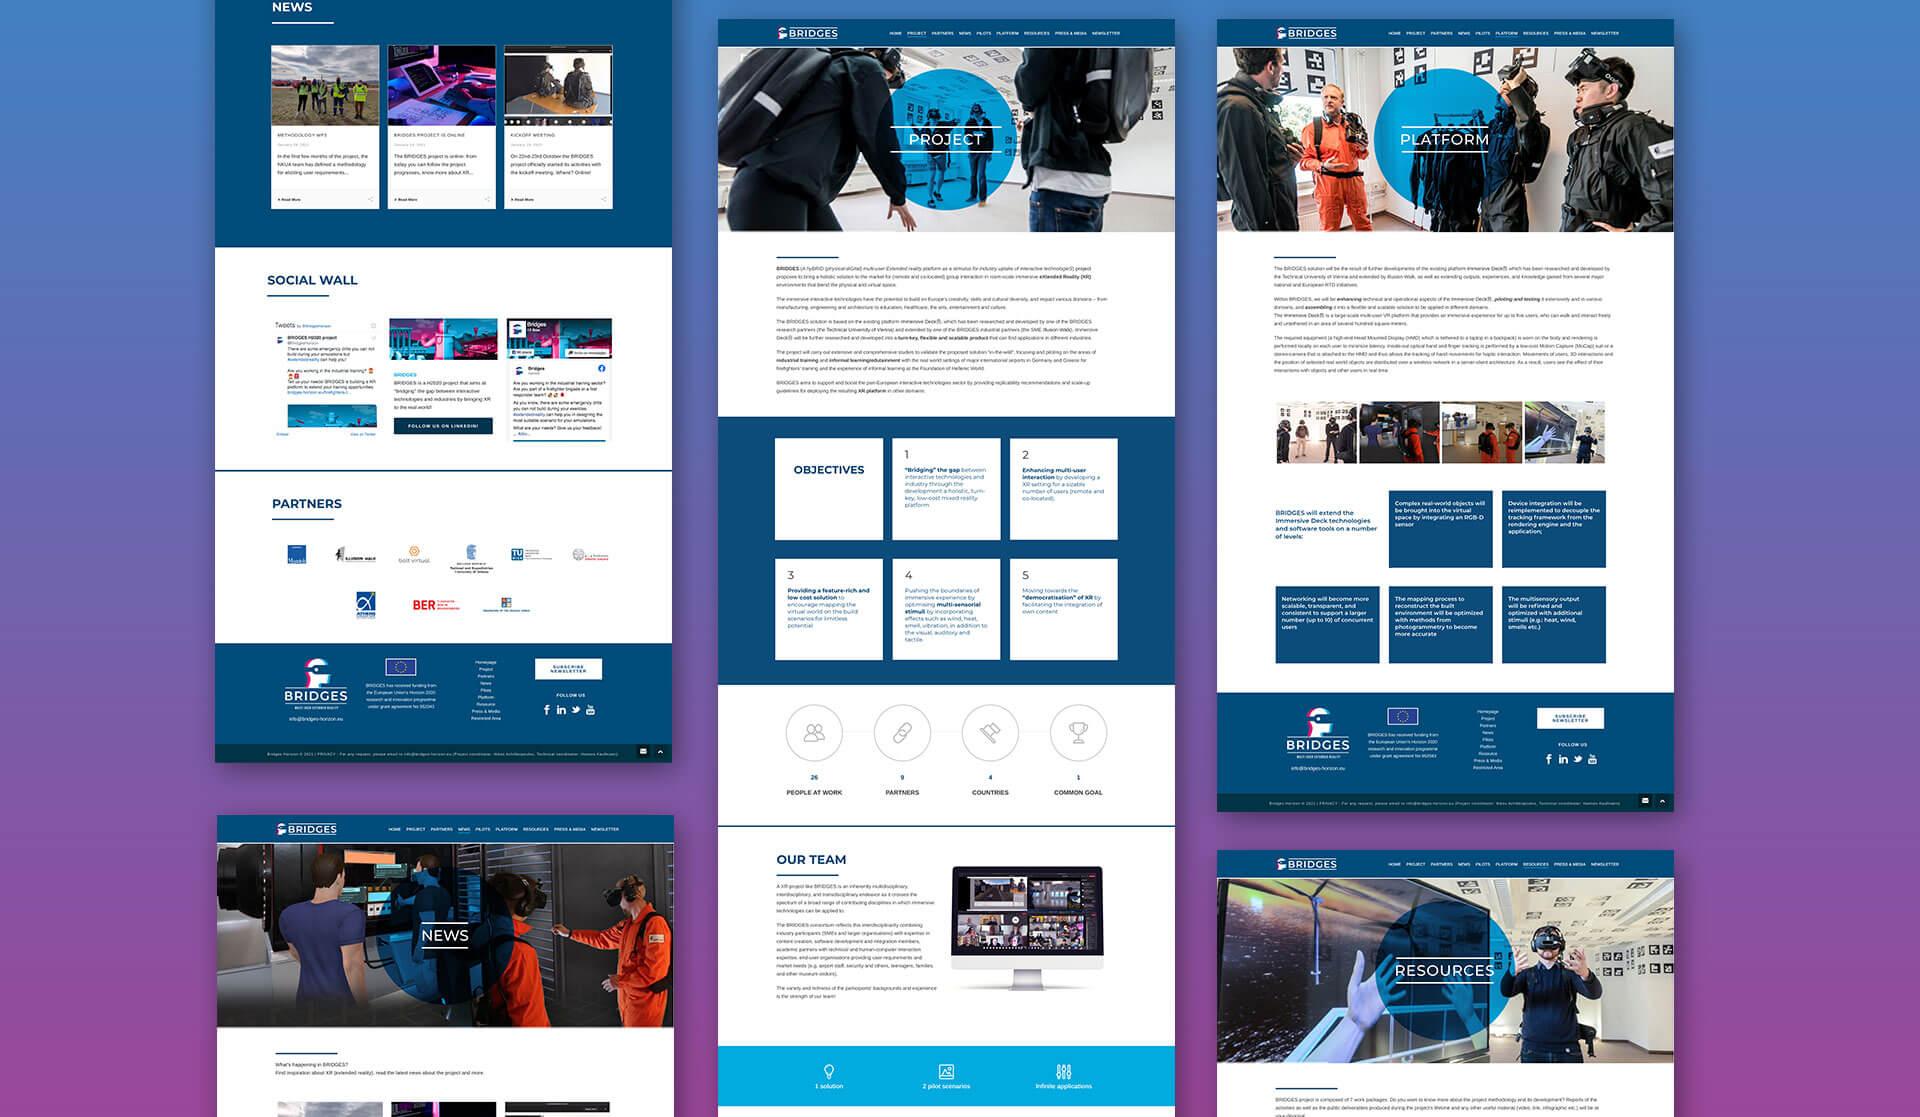 zerouno-design-Bridges-website3